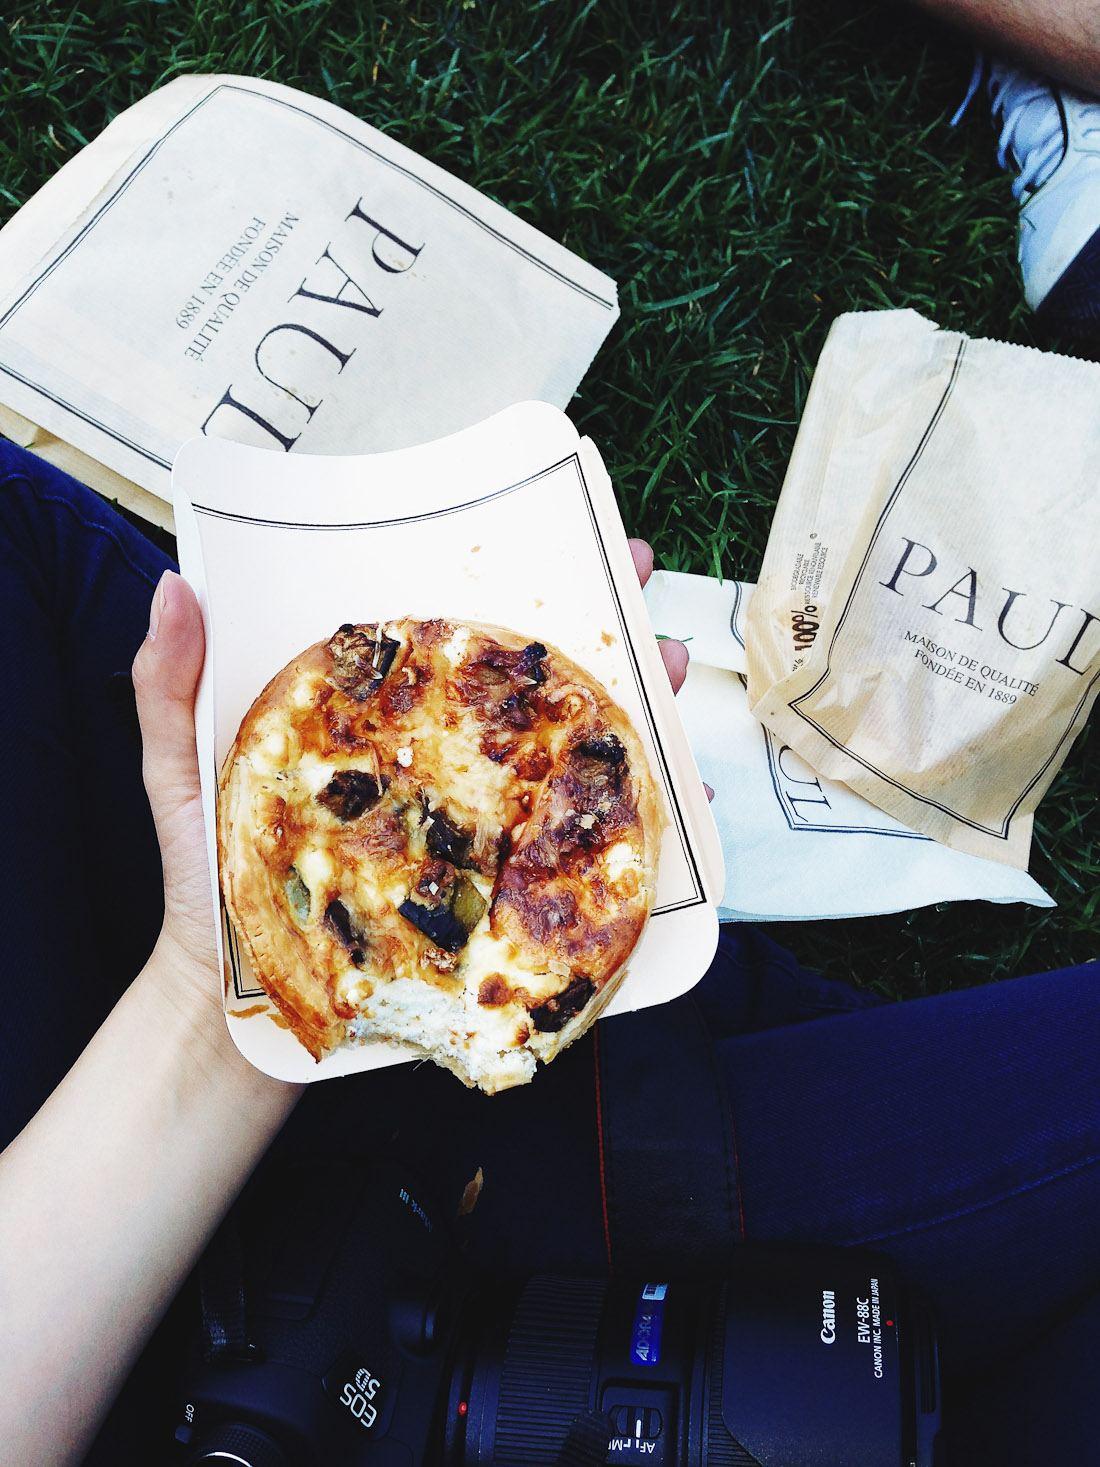 paul france paris bakery tarte quiche veggie vegetable food picnic sher she goes shershegoes1